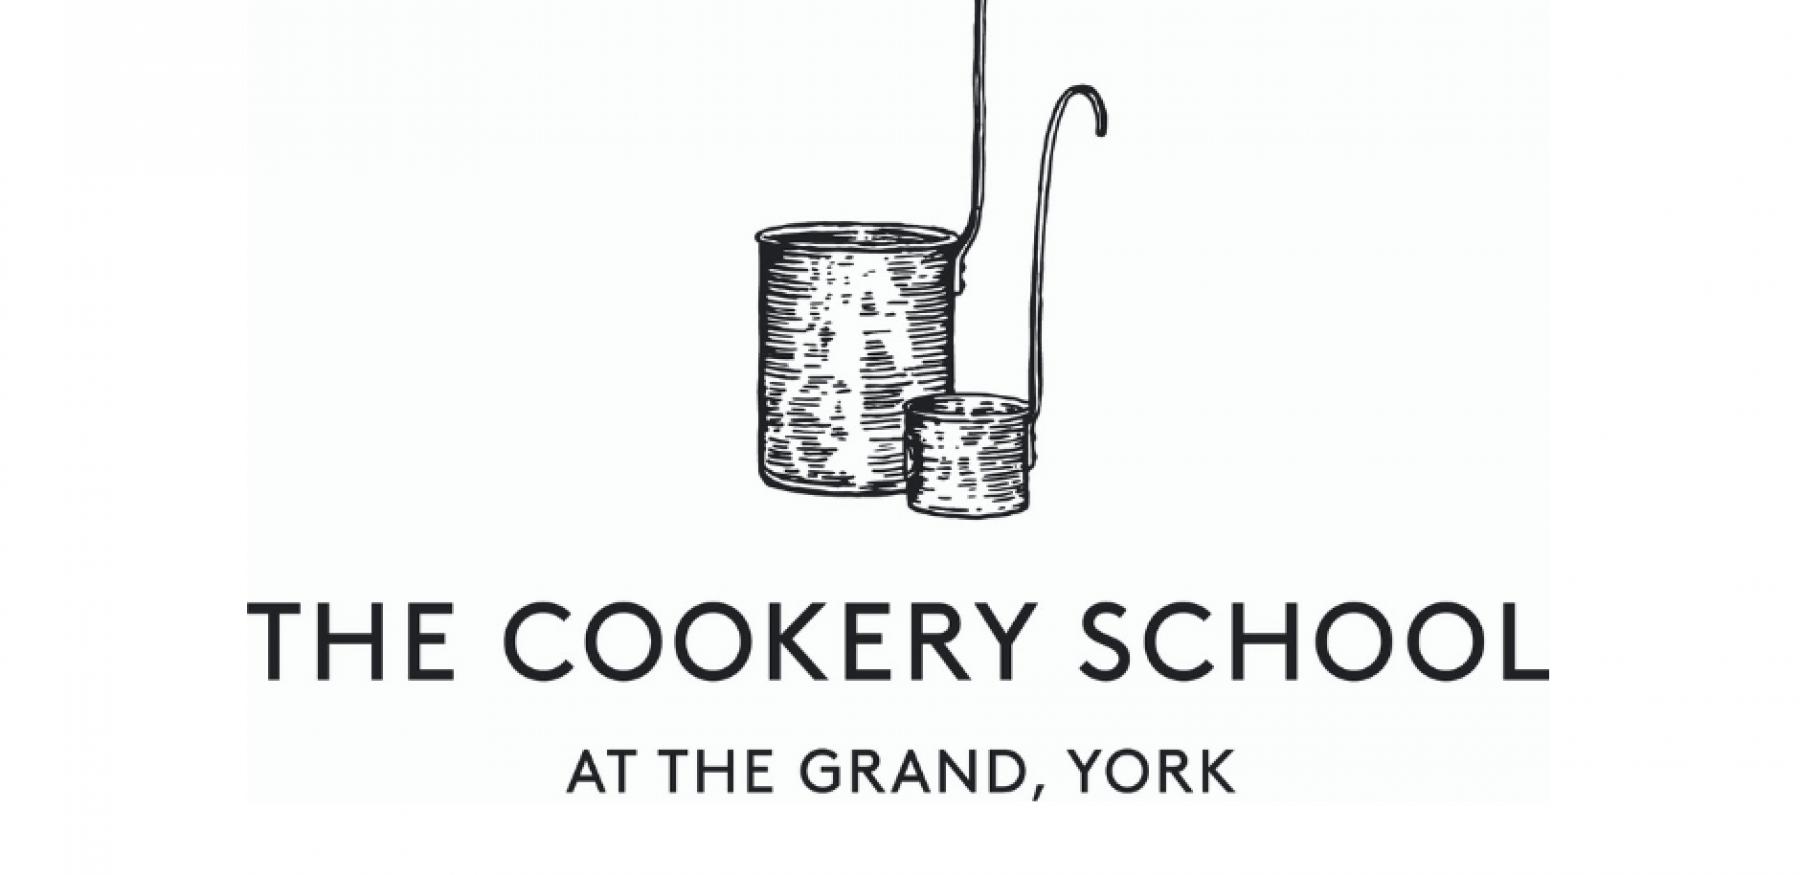 Cookery school logo 1868416447